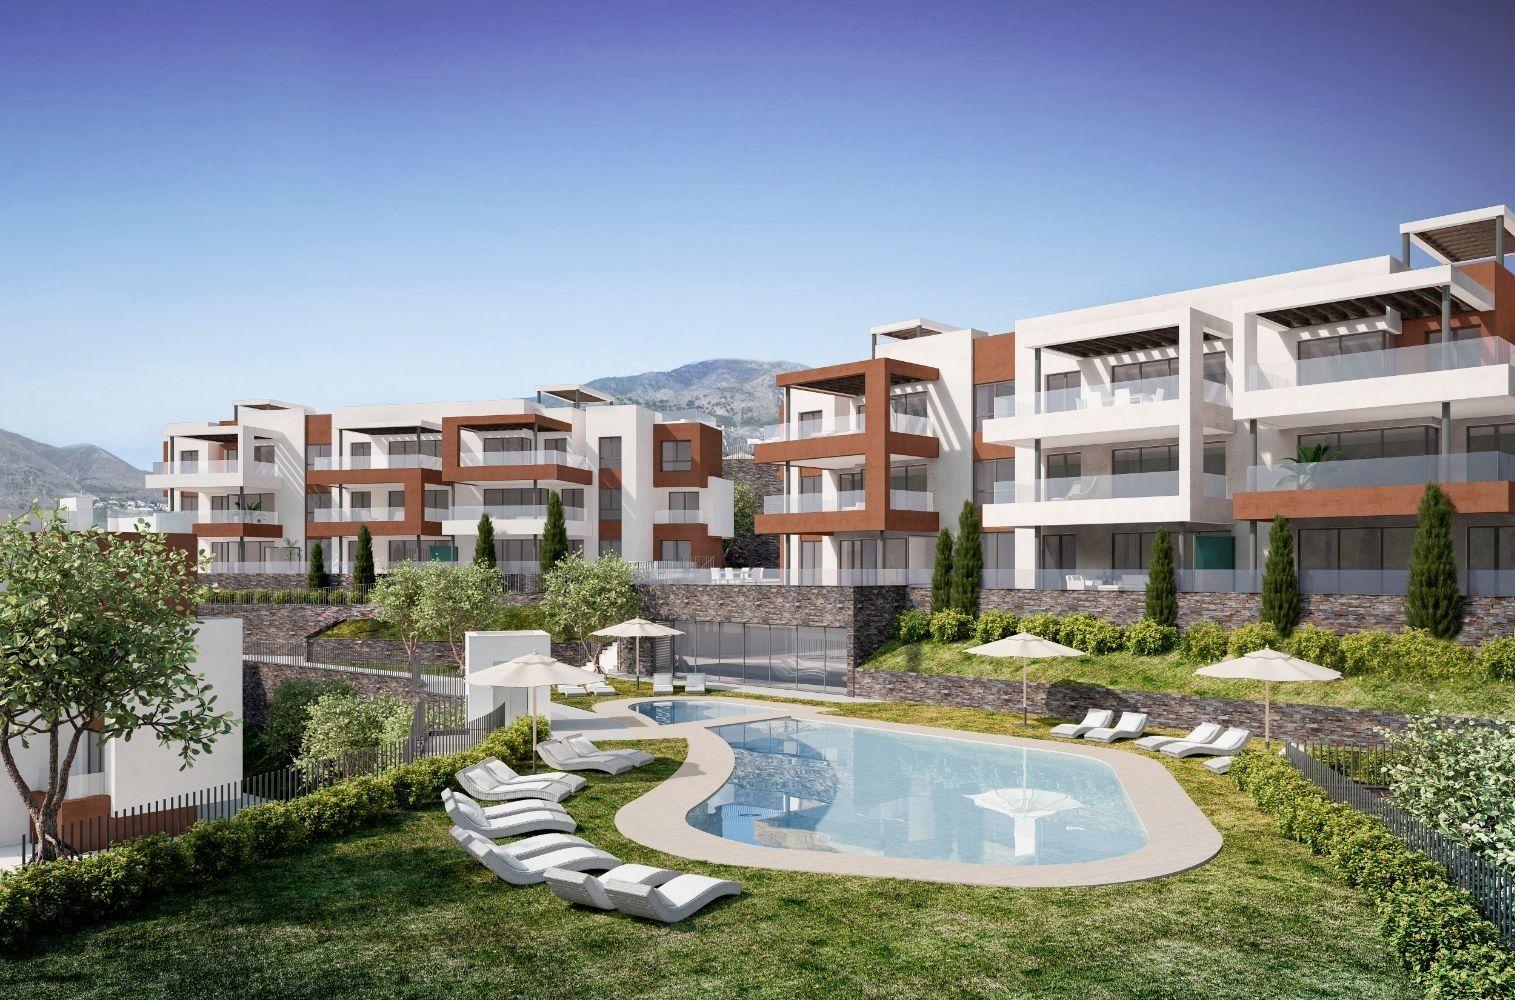 Apartment Beachside in Fuengirola | Christie's International Real Estate